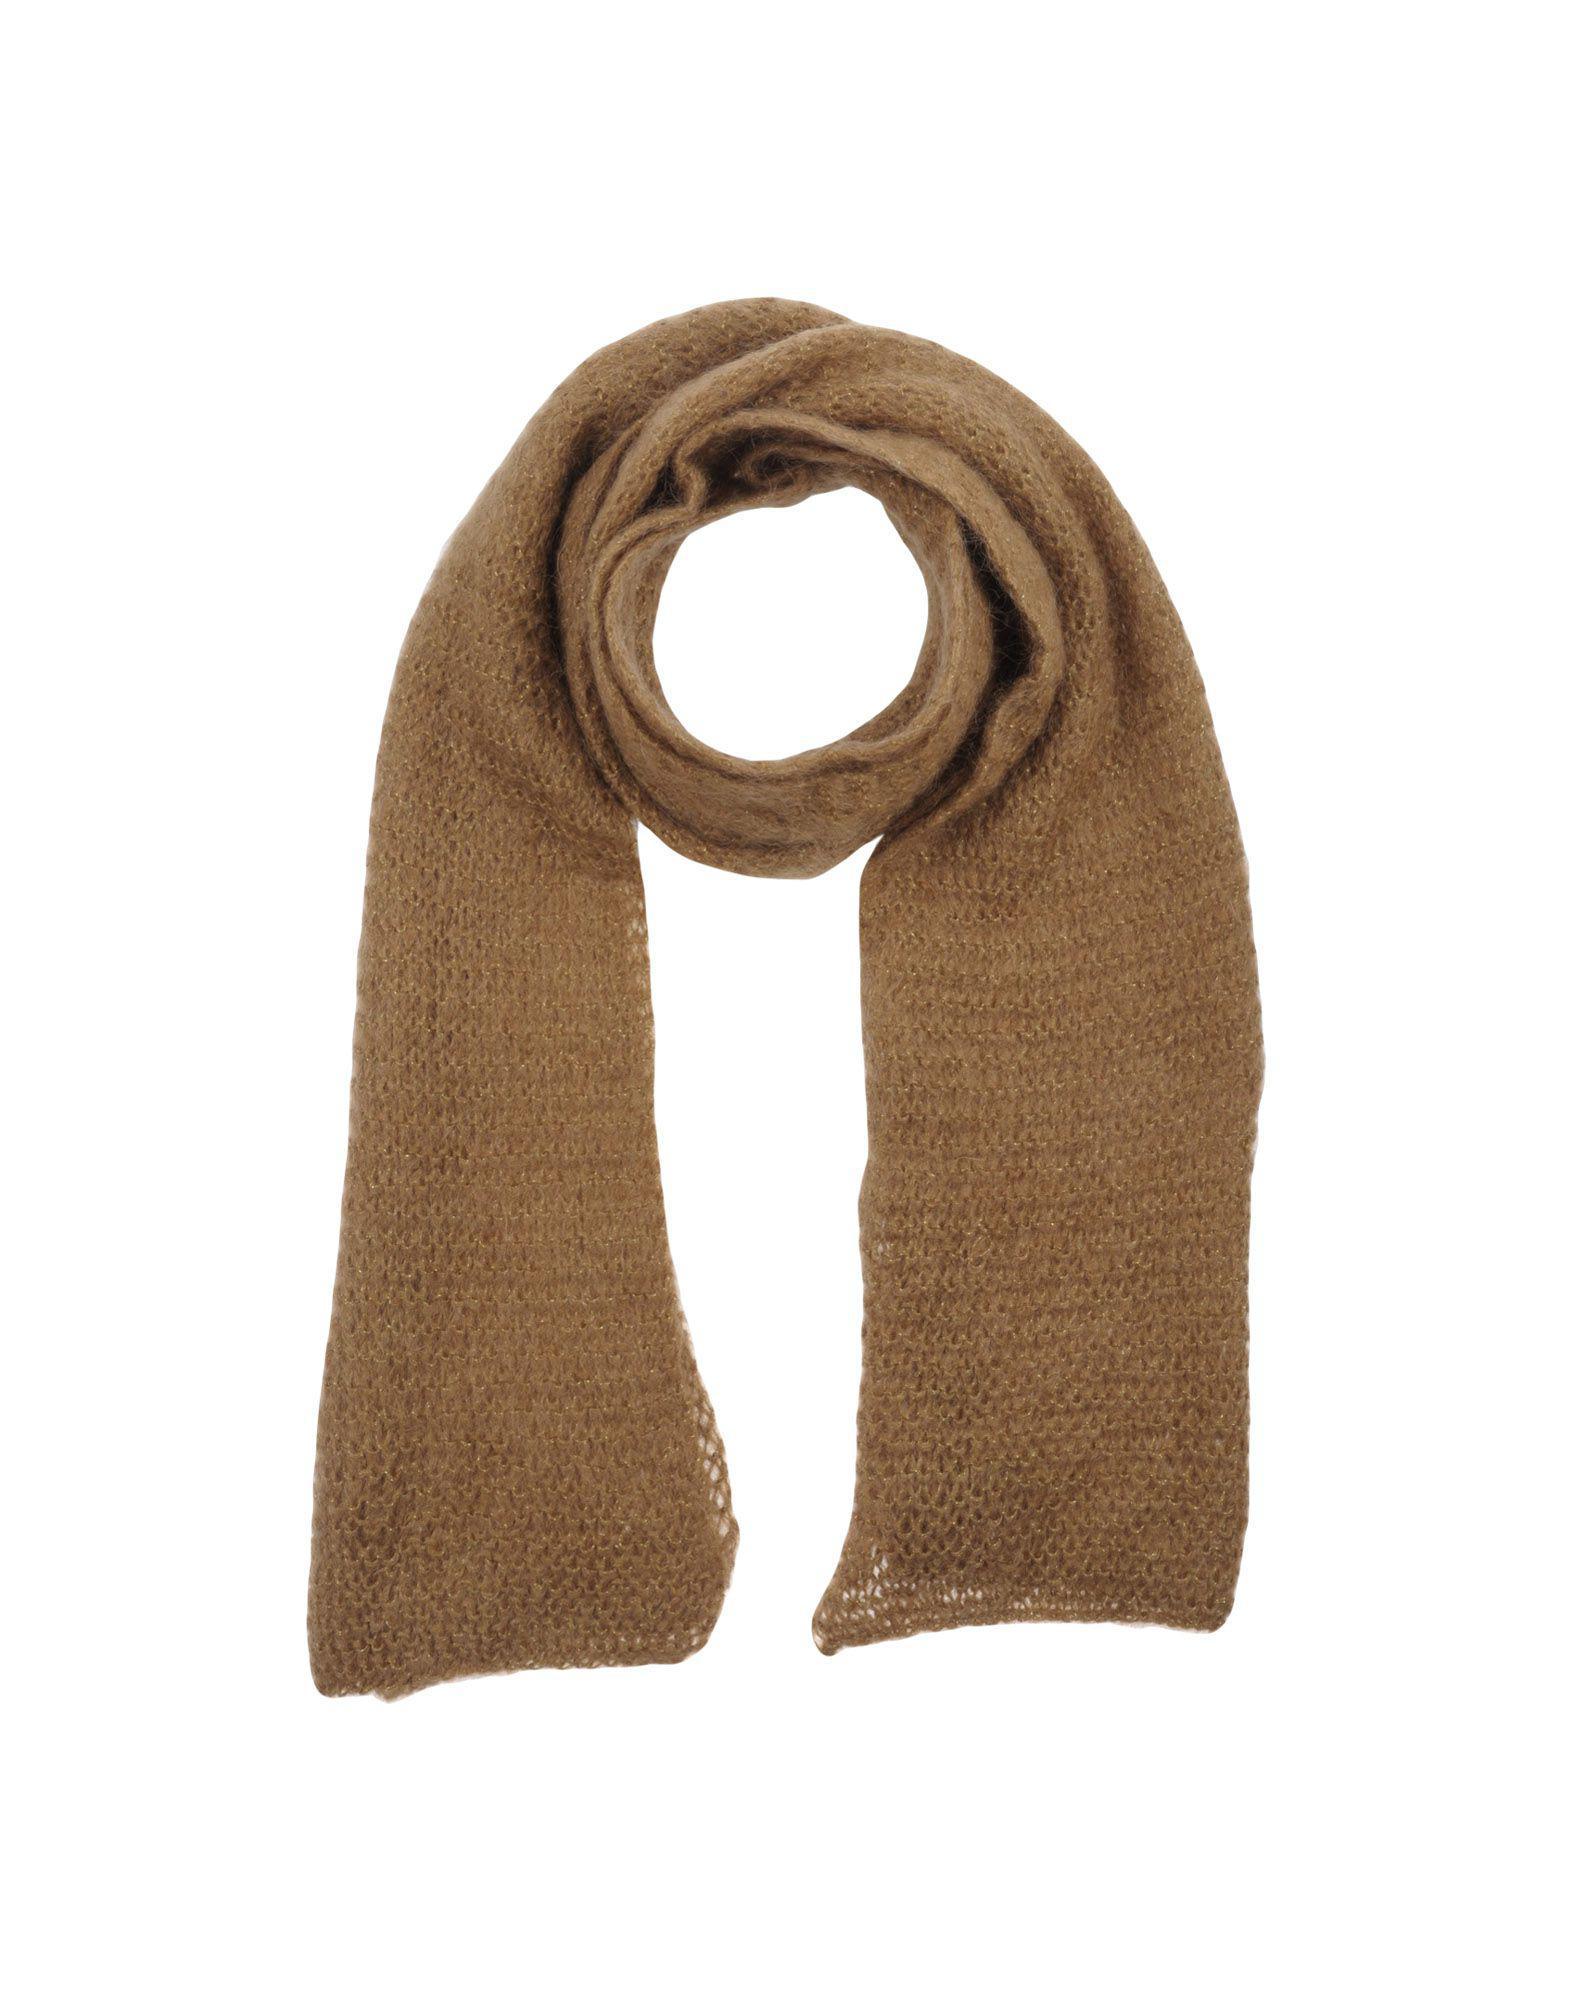 ACCESSORIES - Oblong scarves Mes Demoiselles... yrVaJN